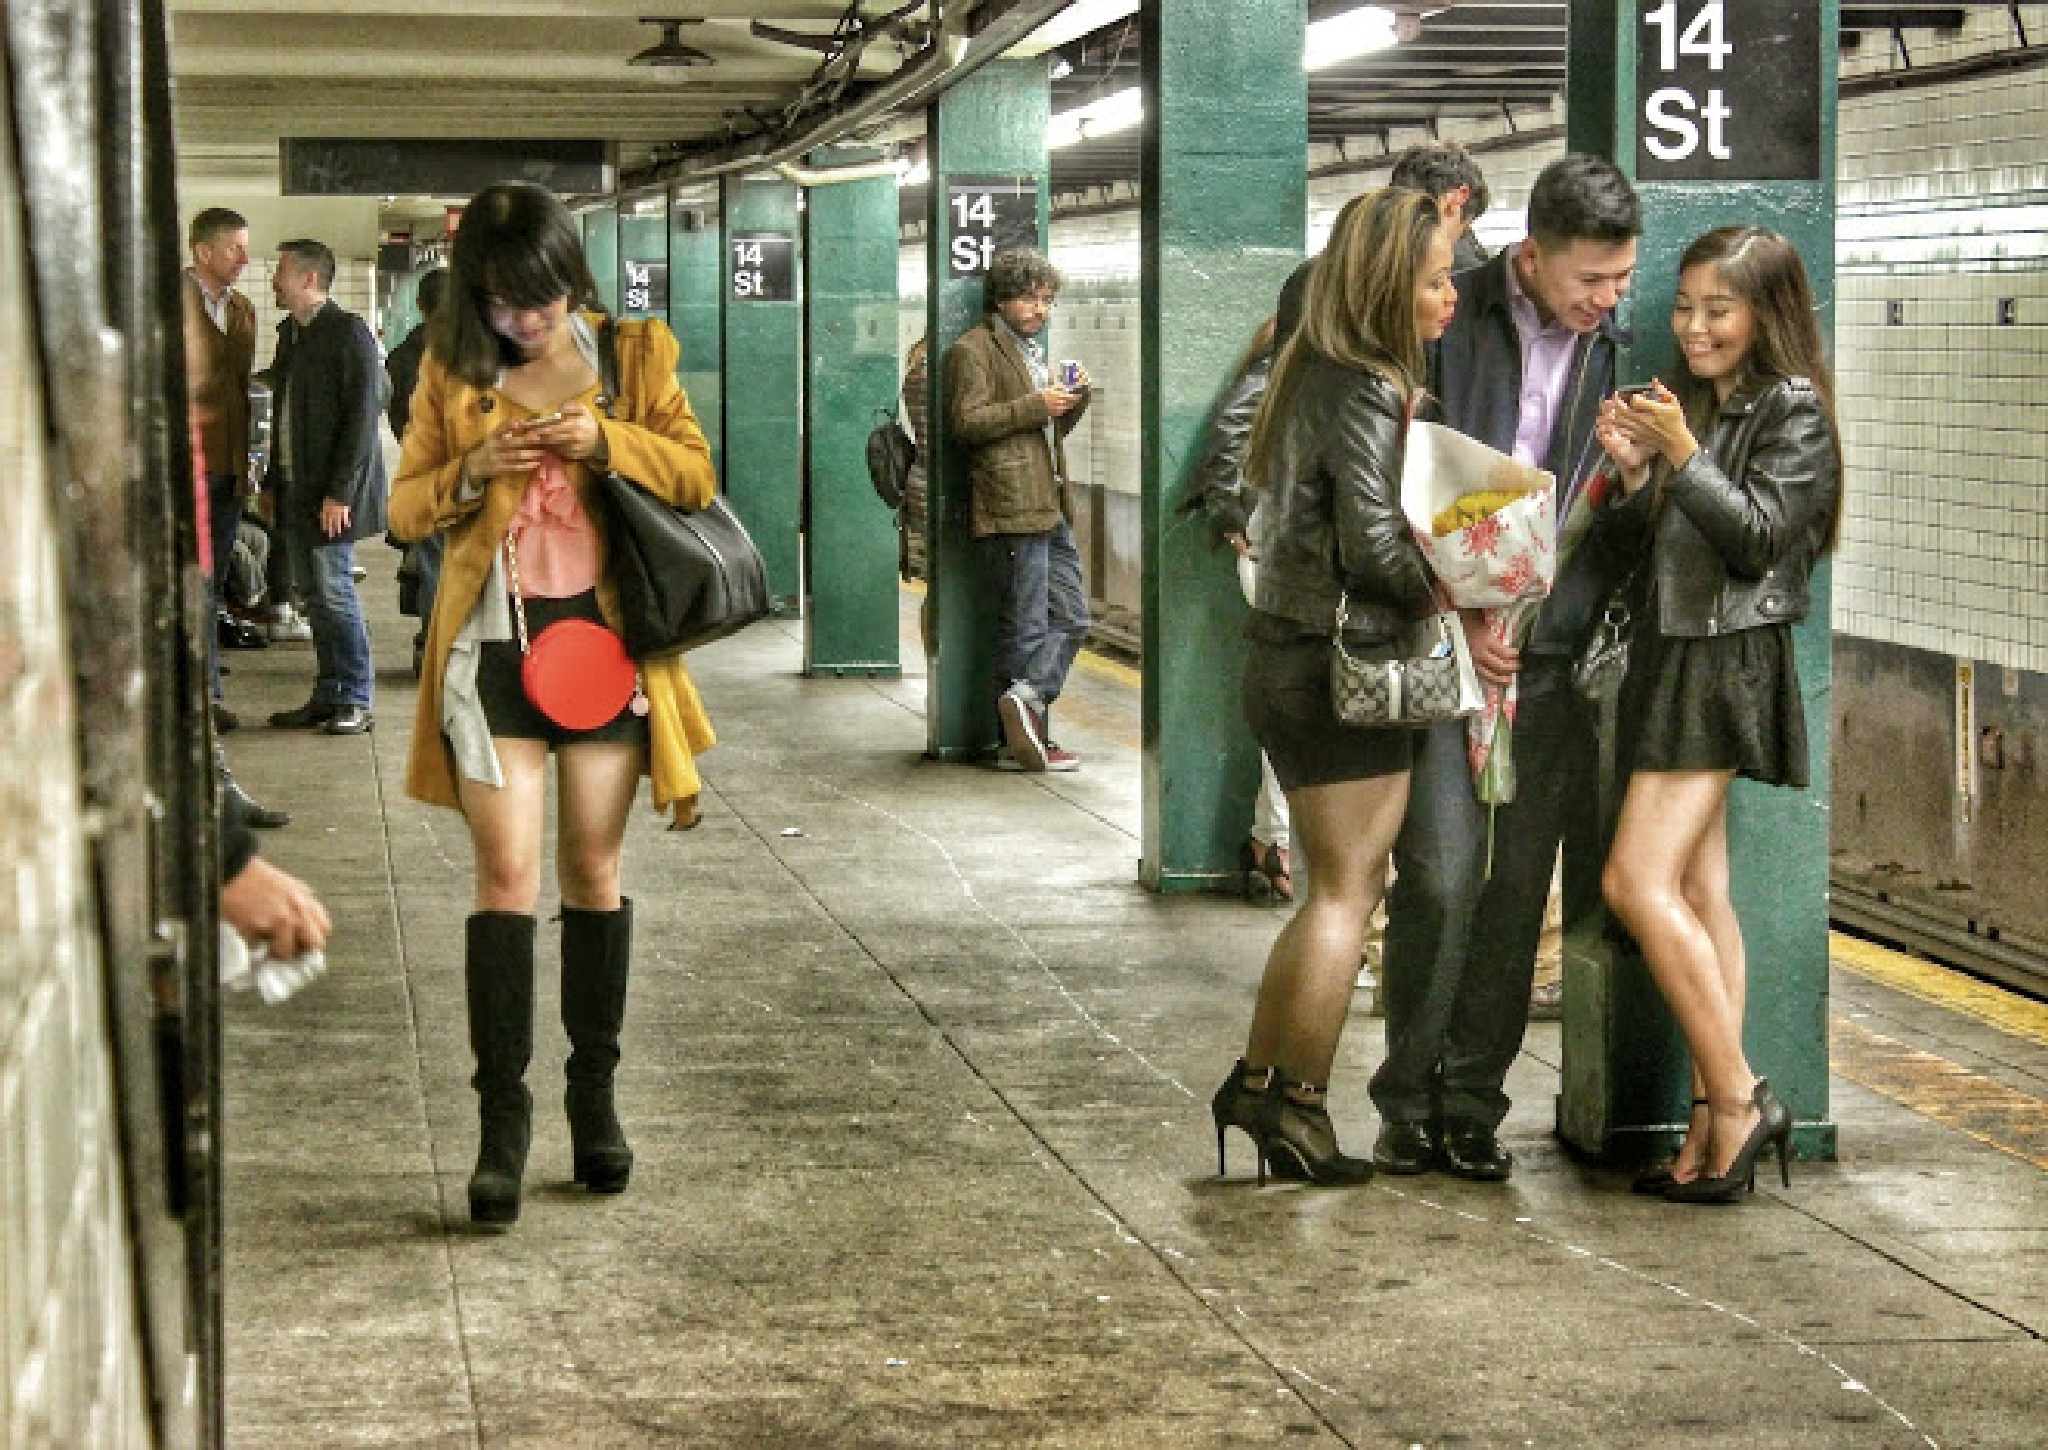 14 ST Station in NYC by Benedito Luiz Arruda